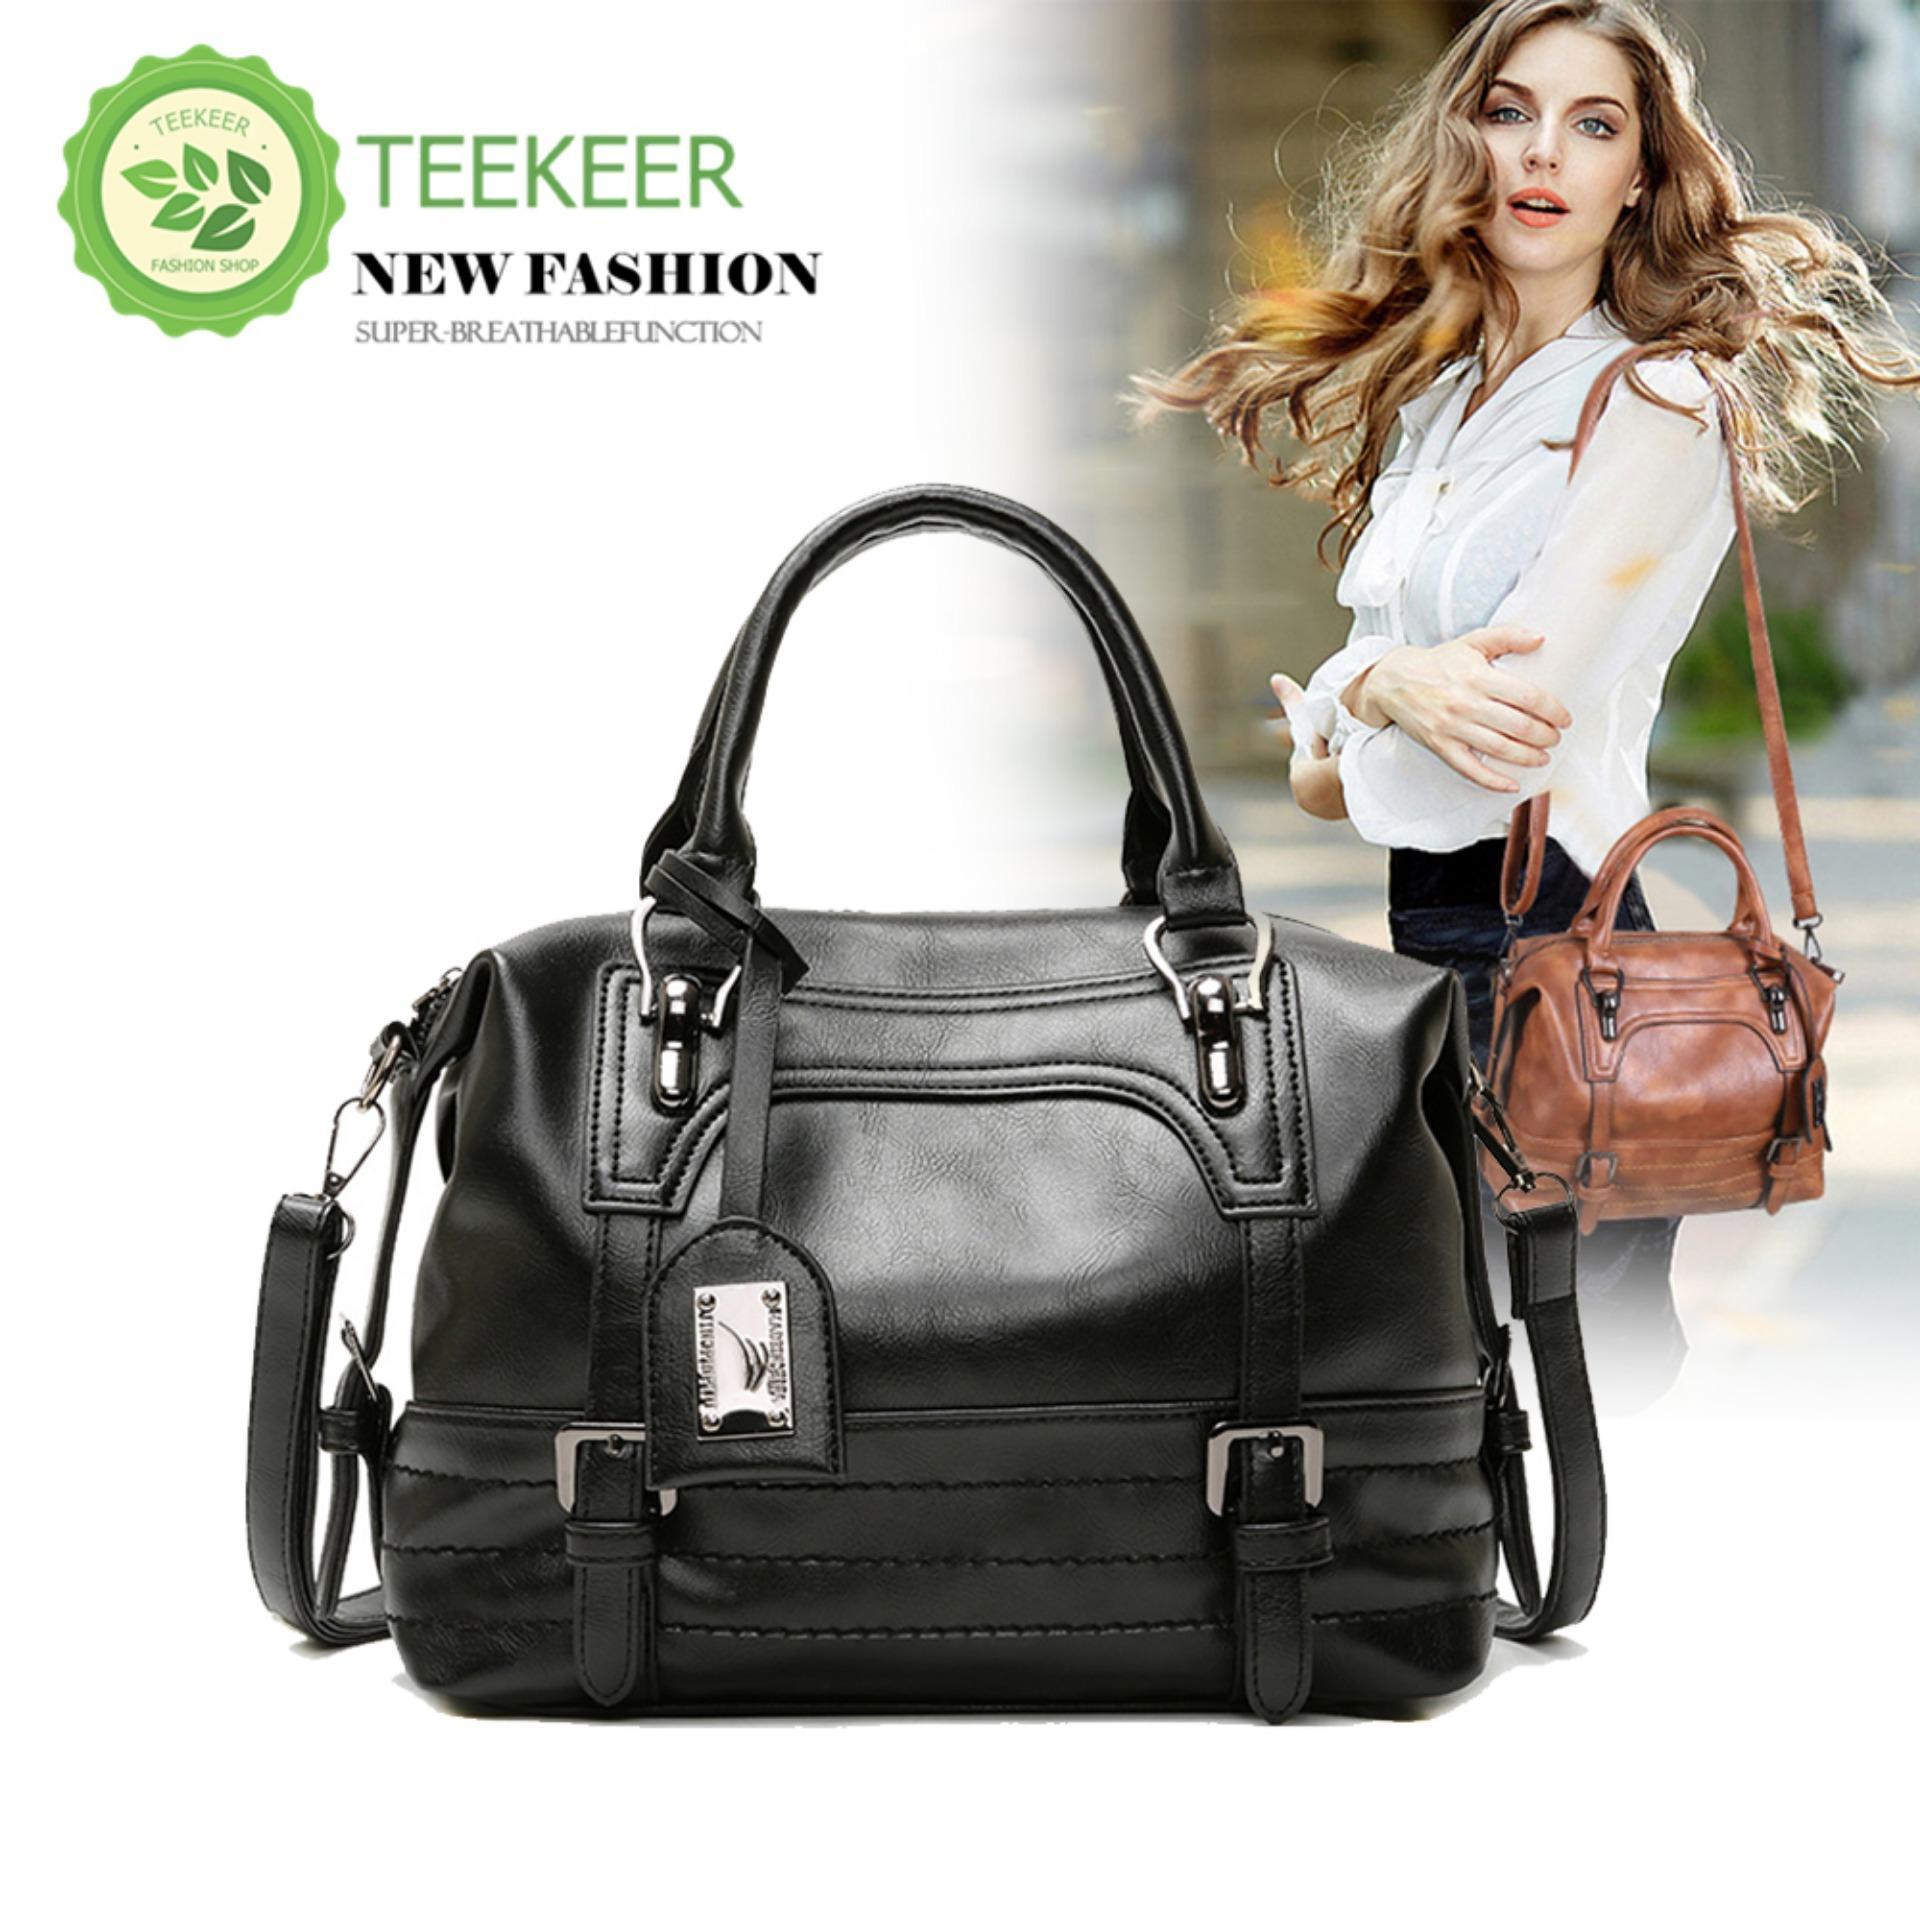 f5e24f93c1f Teekeer Womens Genuine Leather Handbag ,Urban Style Satchel Tote Bag  Vintage Shoulder Top-Handle Crossbody Handbags